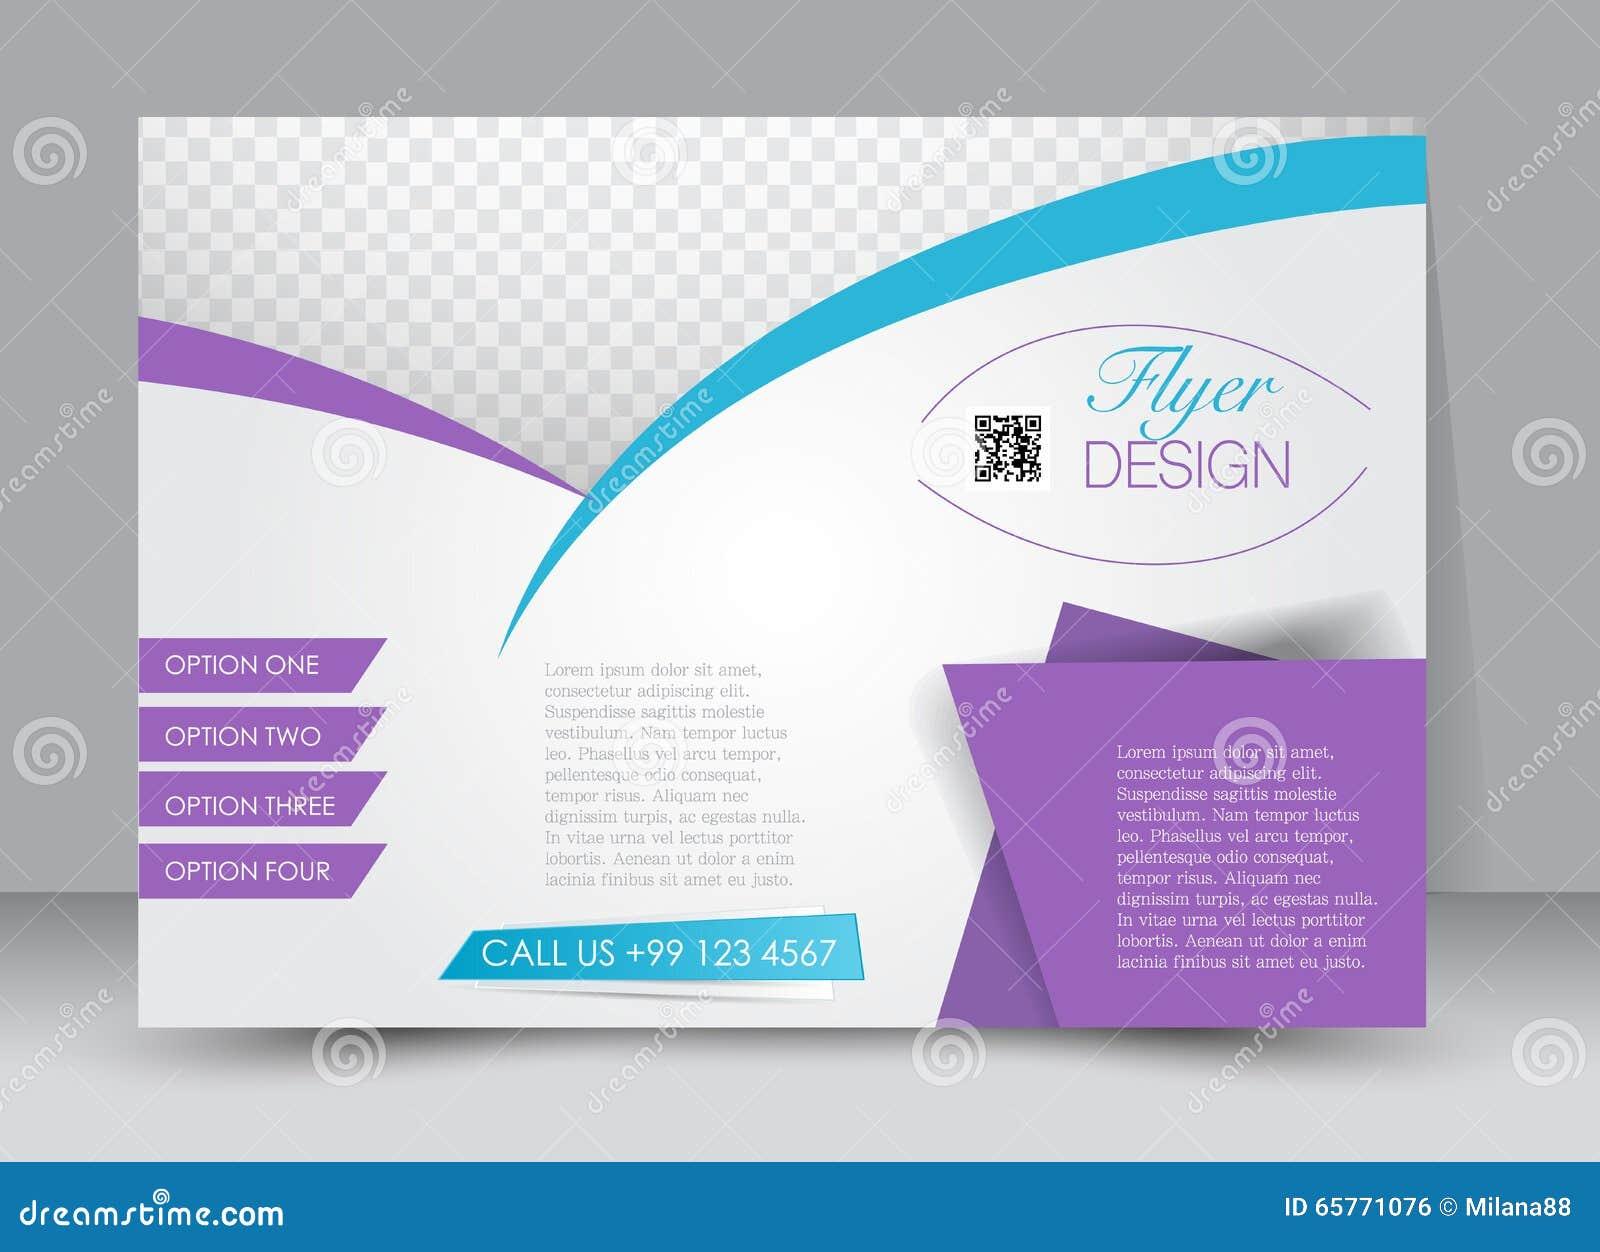 flyer brochure magazine cover template design landscape flyer brochure magazine cover template design landscape orientation